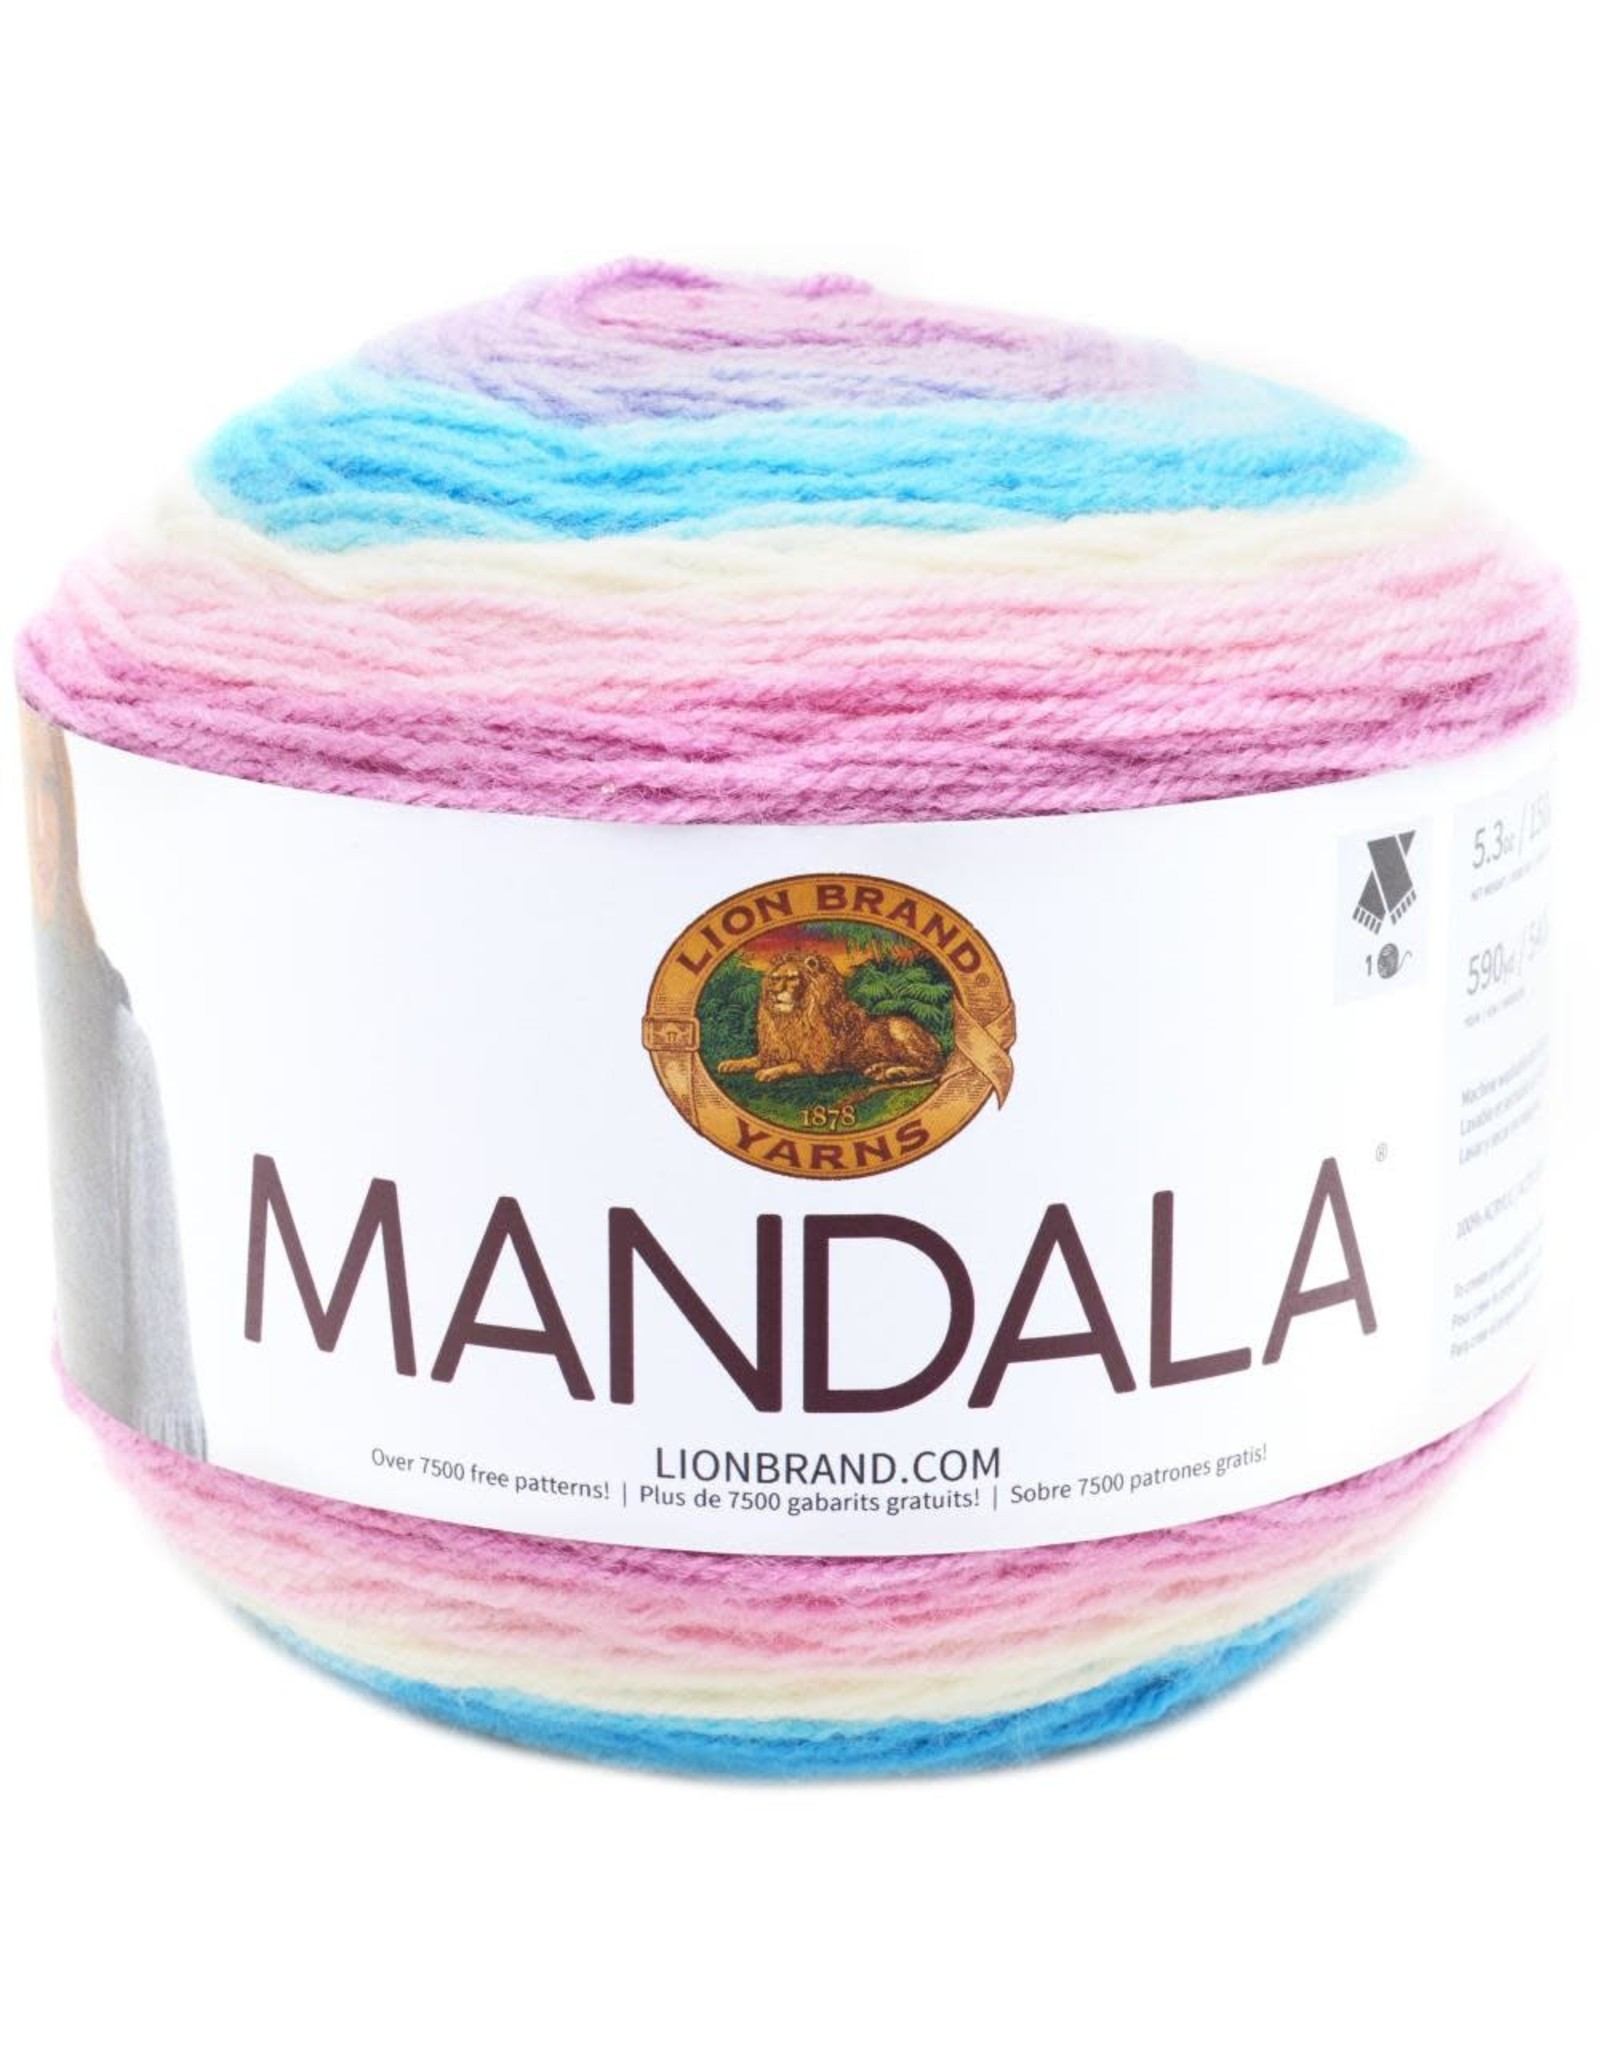 Liger - Mandala - Lion Brand